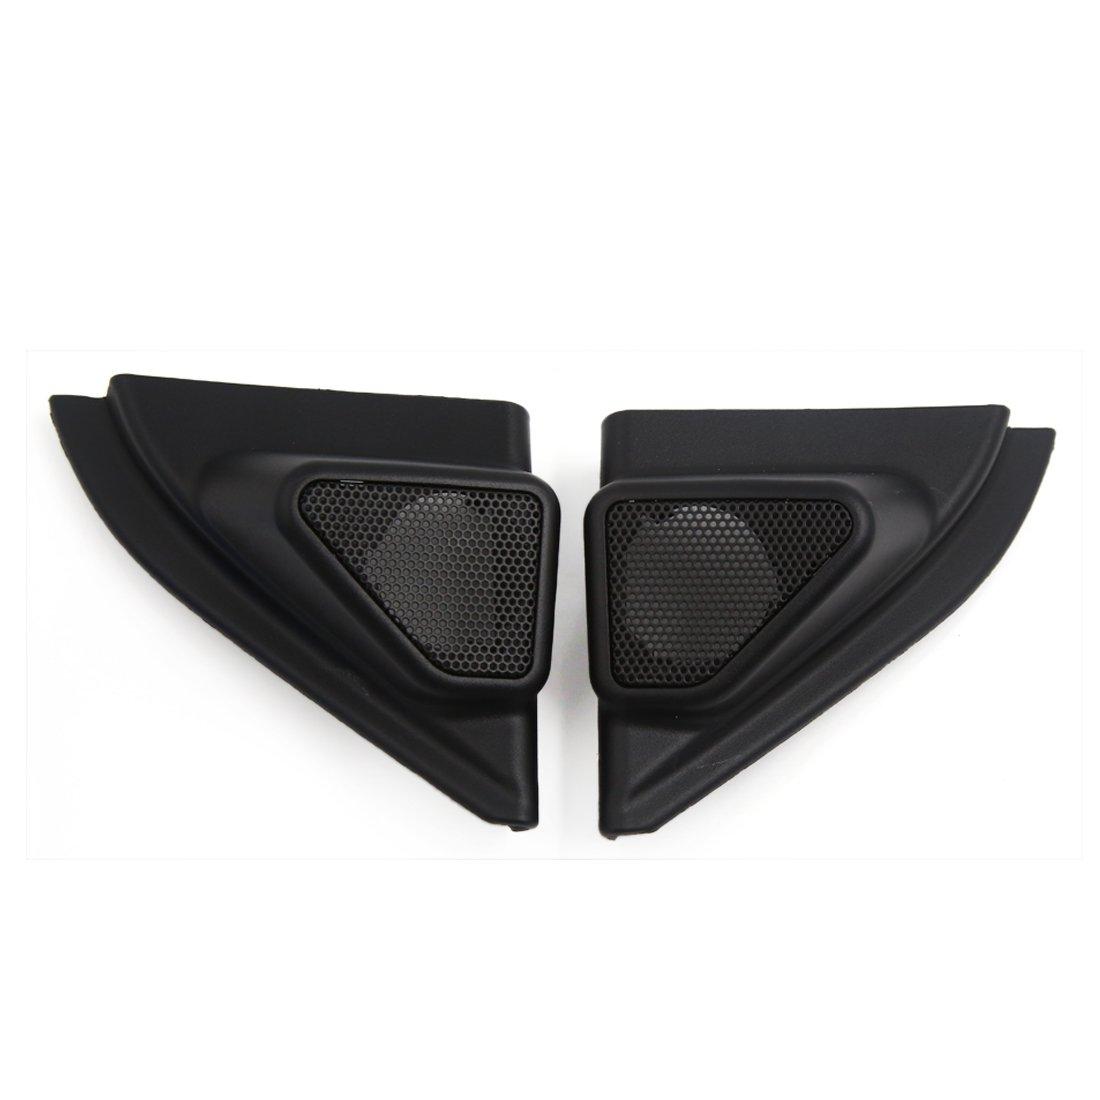 uxcell 2 Pcs Black Plastic Car Horn Trumpet Dustproof Cover for 2014 Toyota Corolla